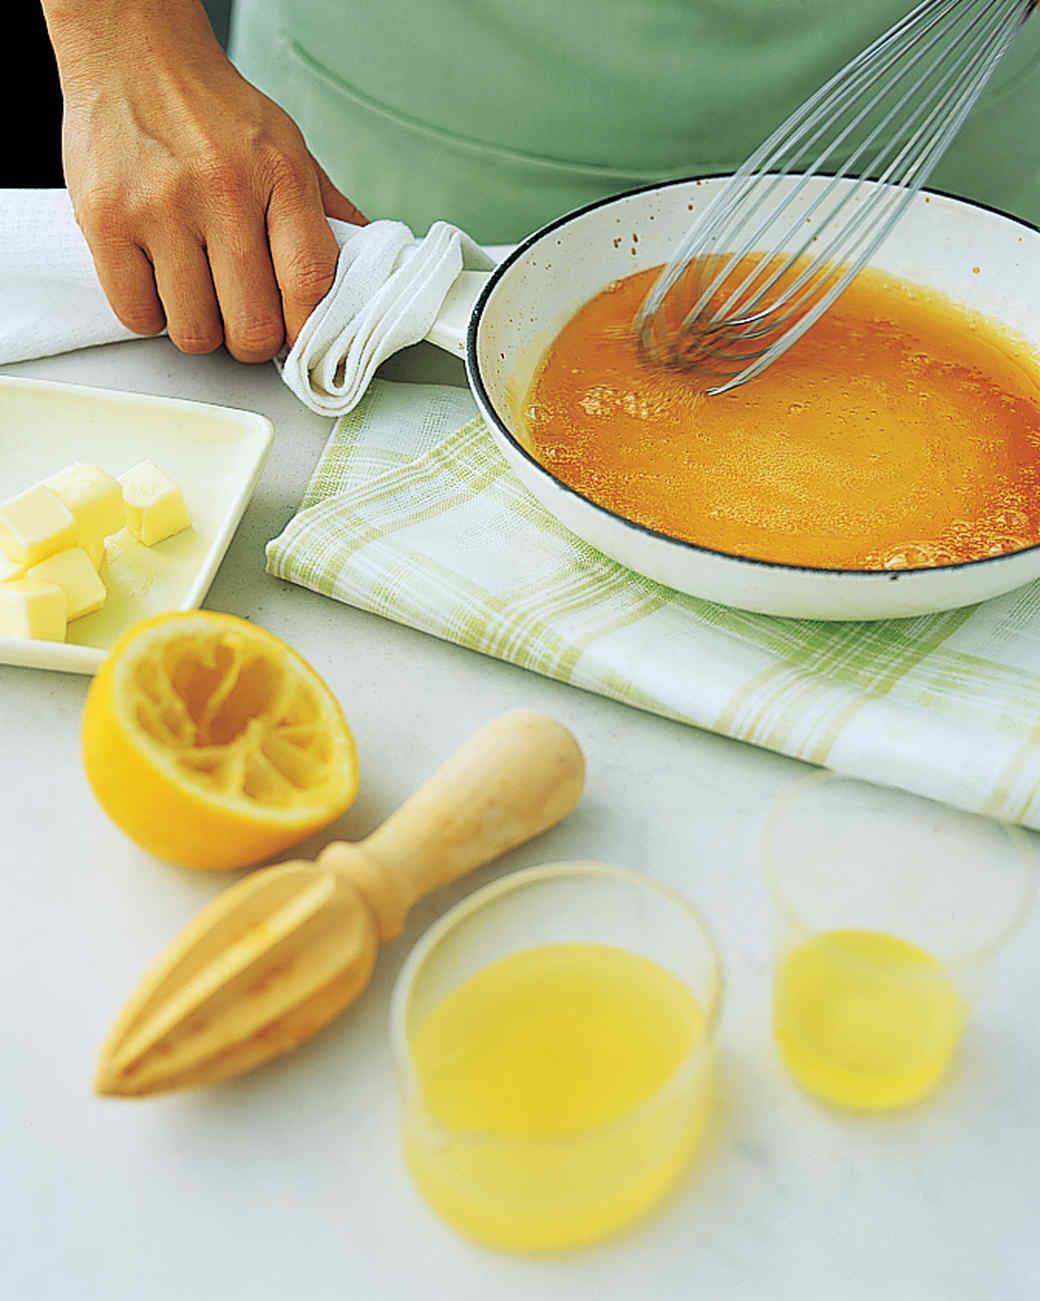 Lemon-Caramel Sauce